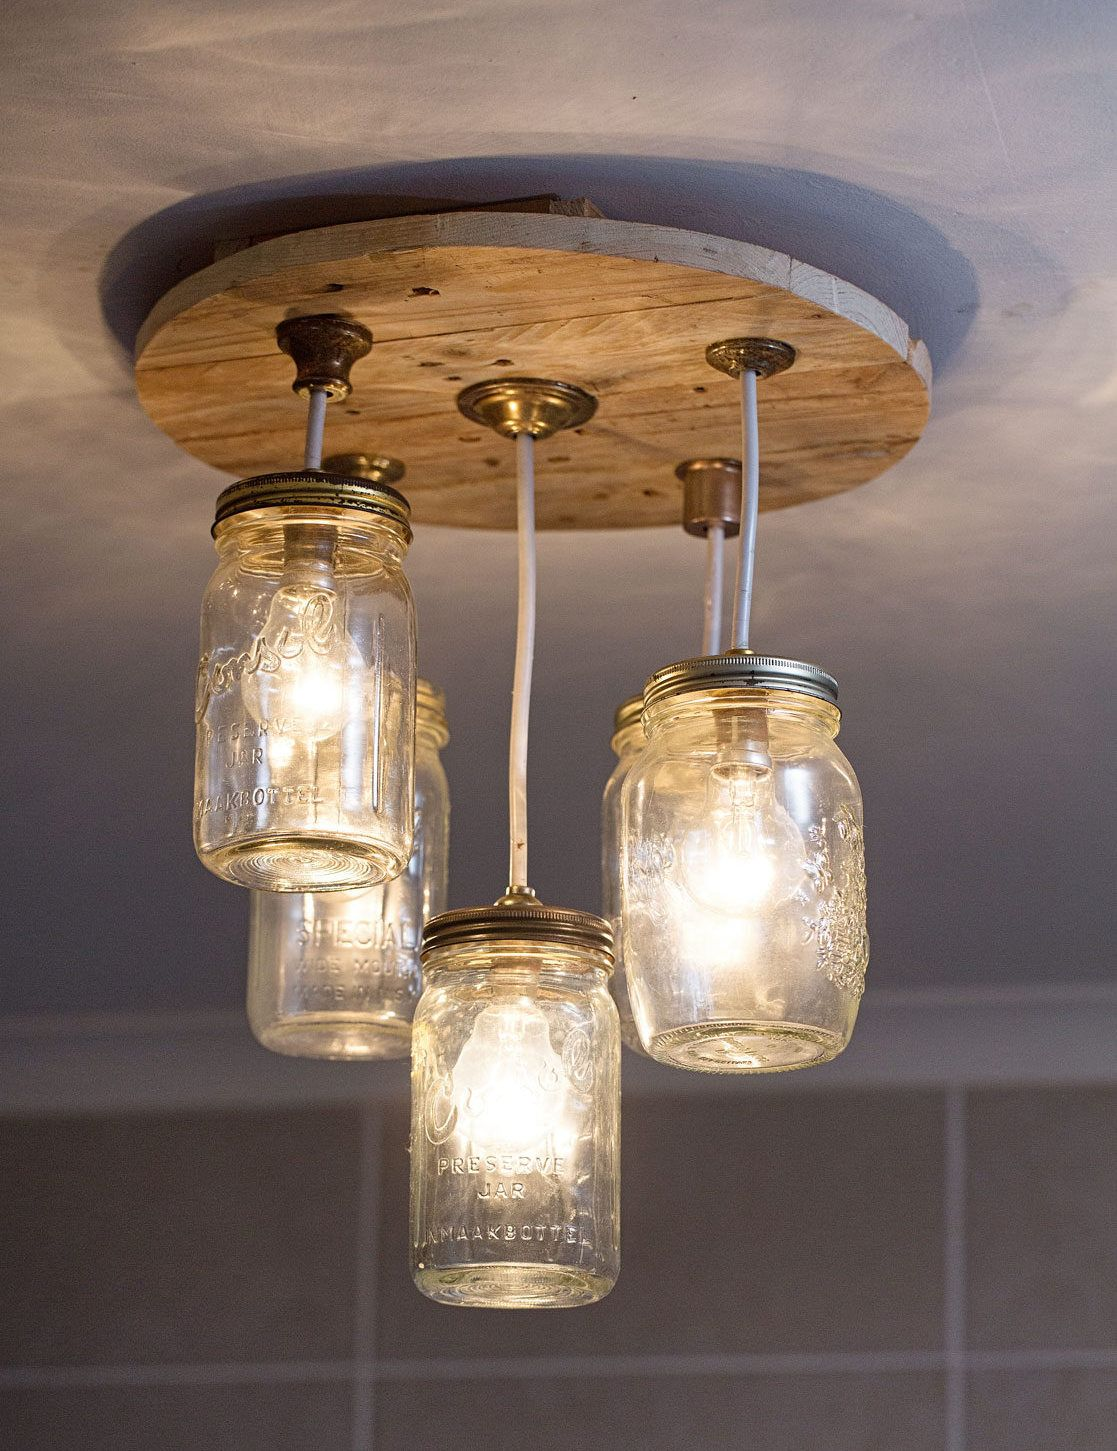 Diy mason jar chandelier mason jar chandelier jar chandelier and diy mason jar chandelier arubaitofo Gallery